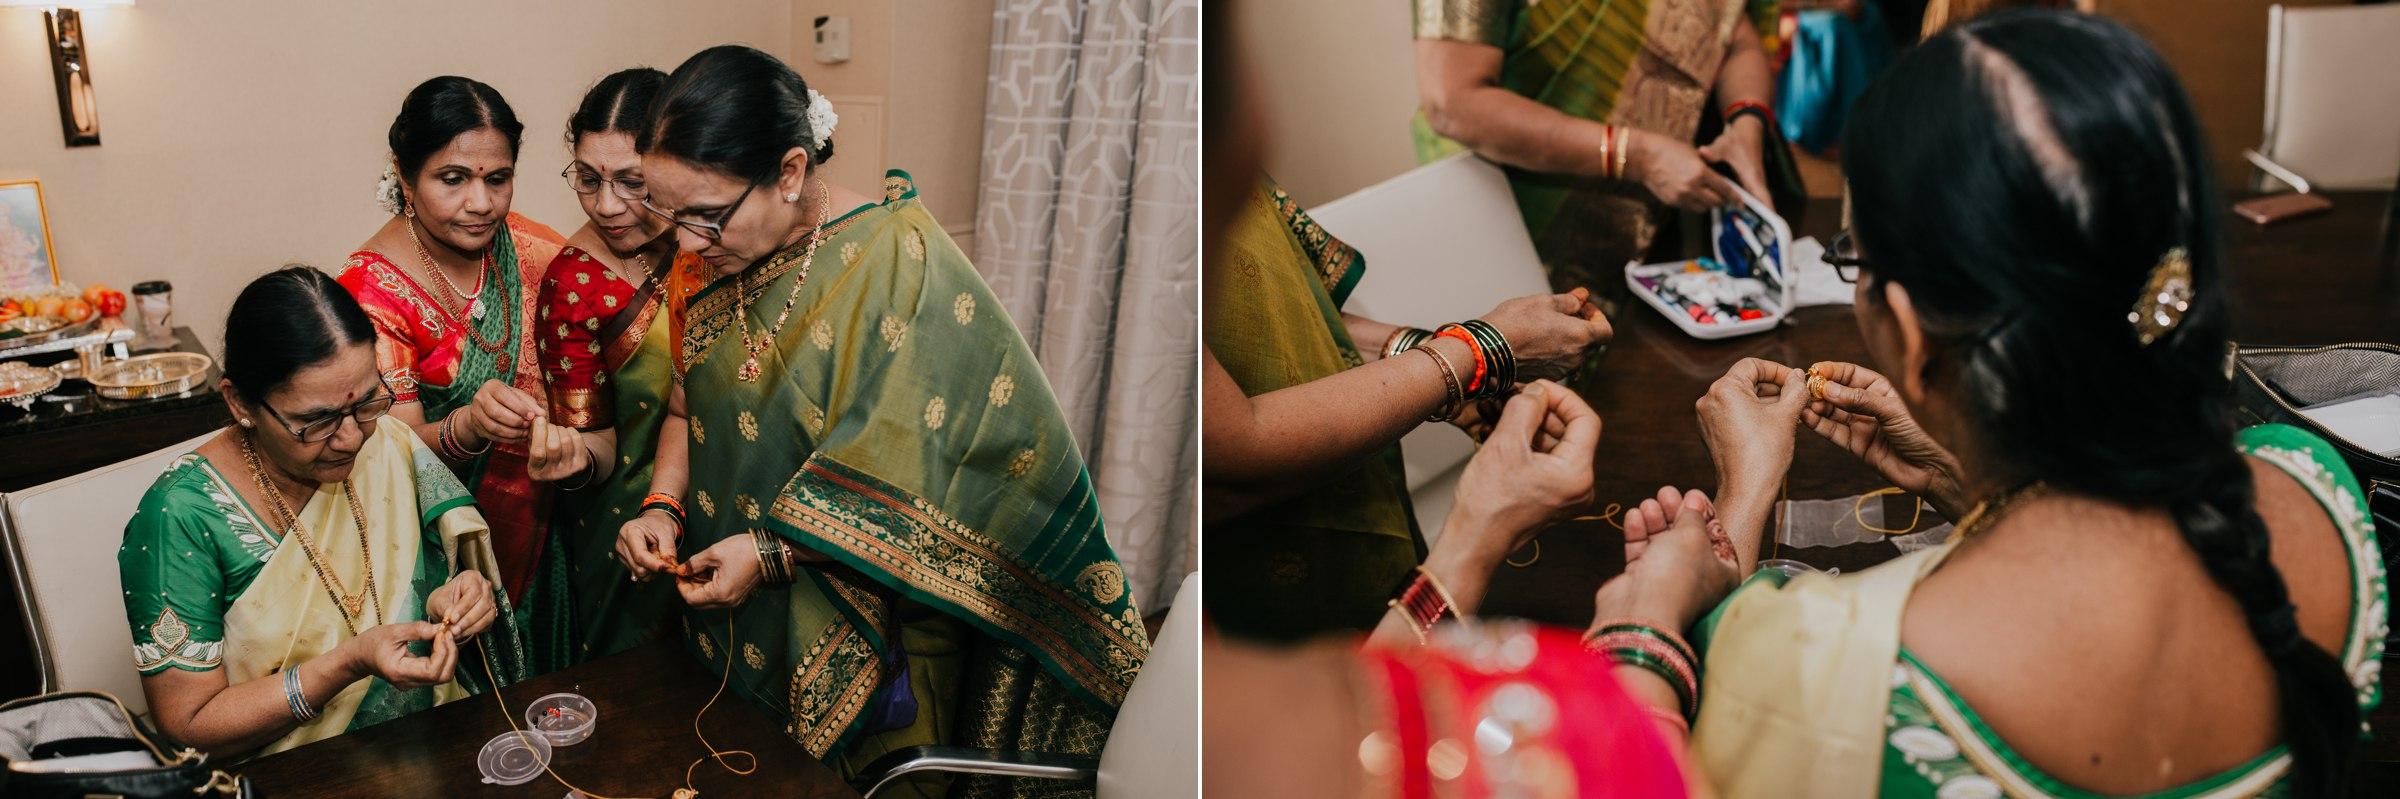 indian wedding minneapolis minnesota texas austin wedding elopement destination intimate best photographer_0002.jpg